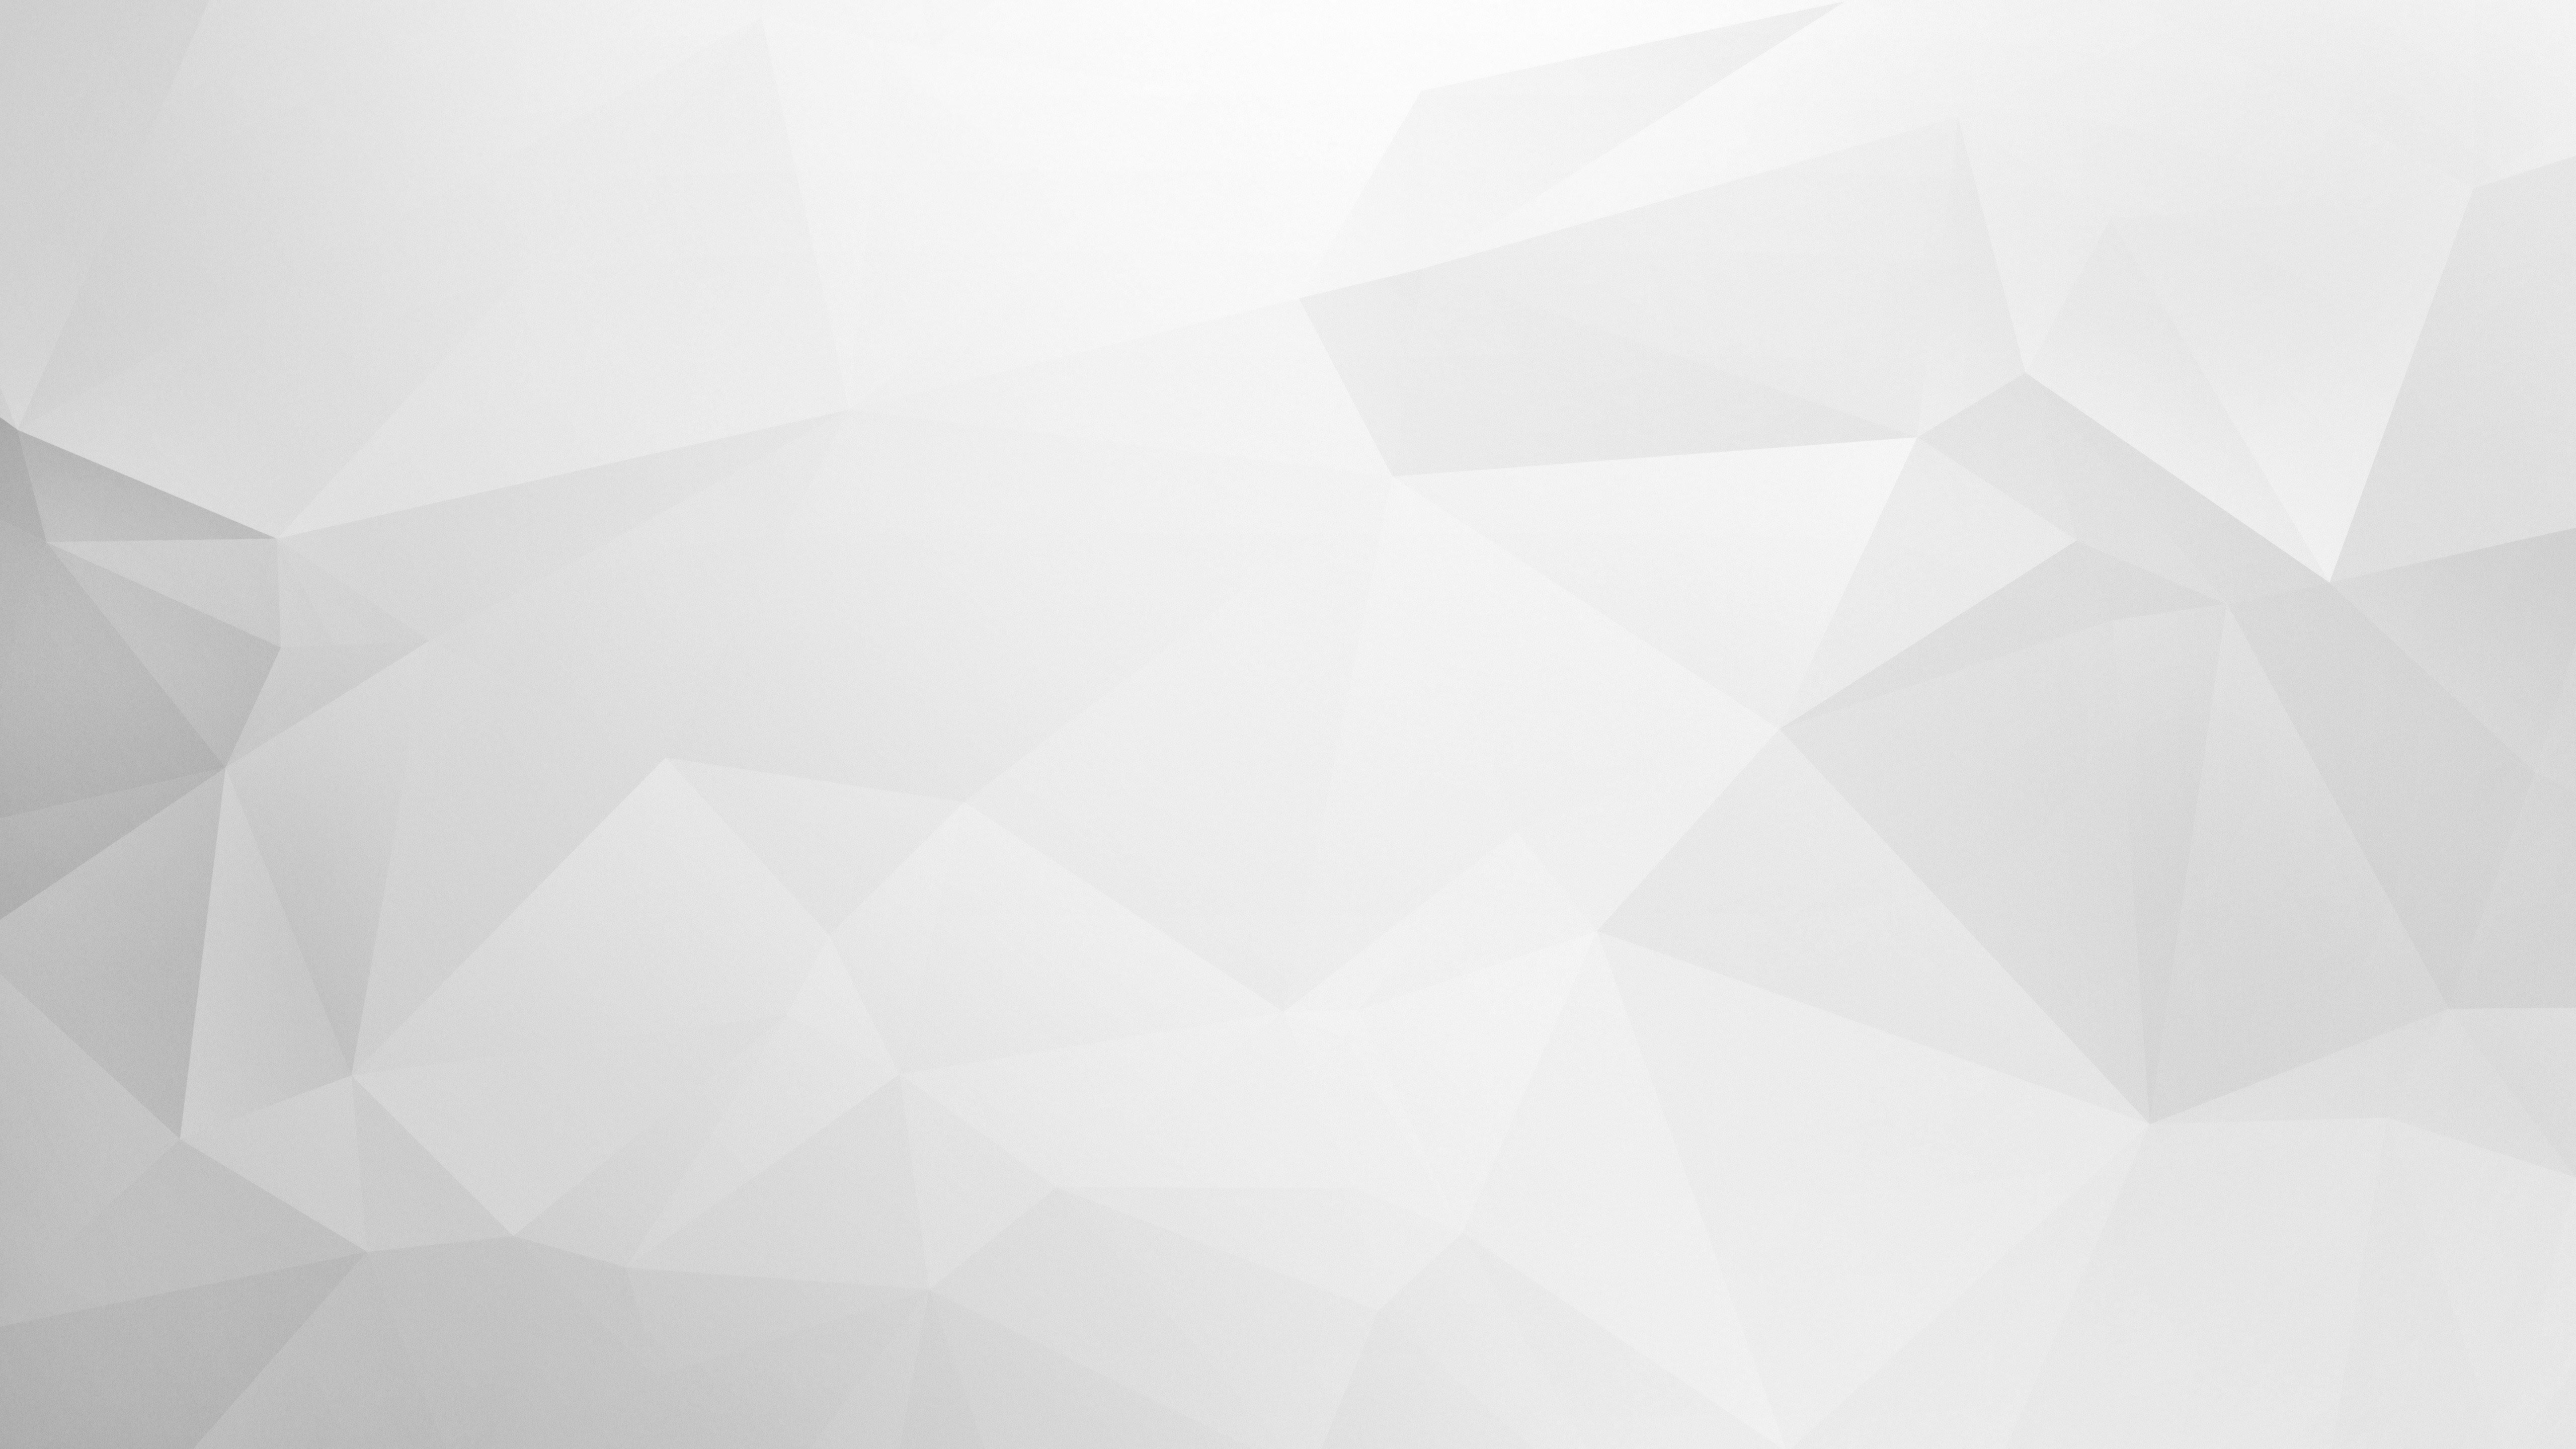 Cool White Wallpapers - WallpaperSafari